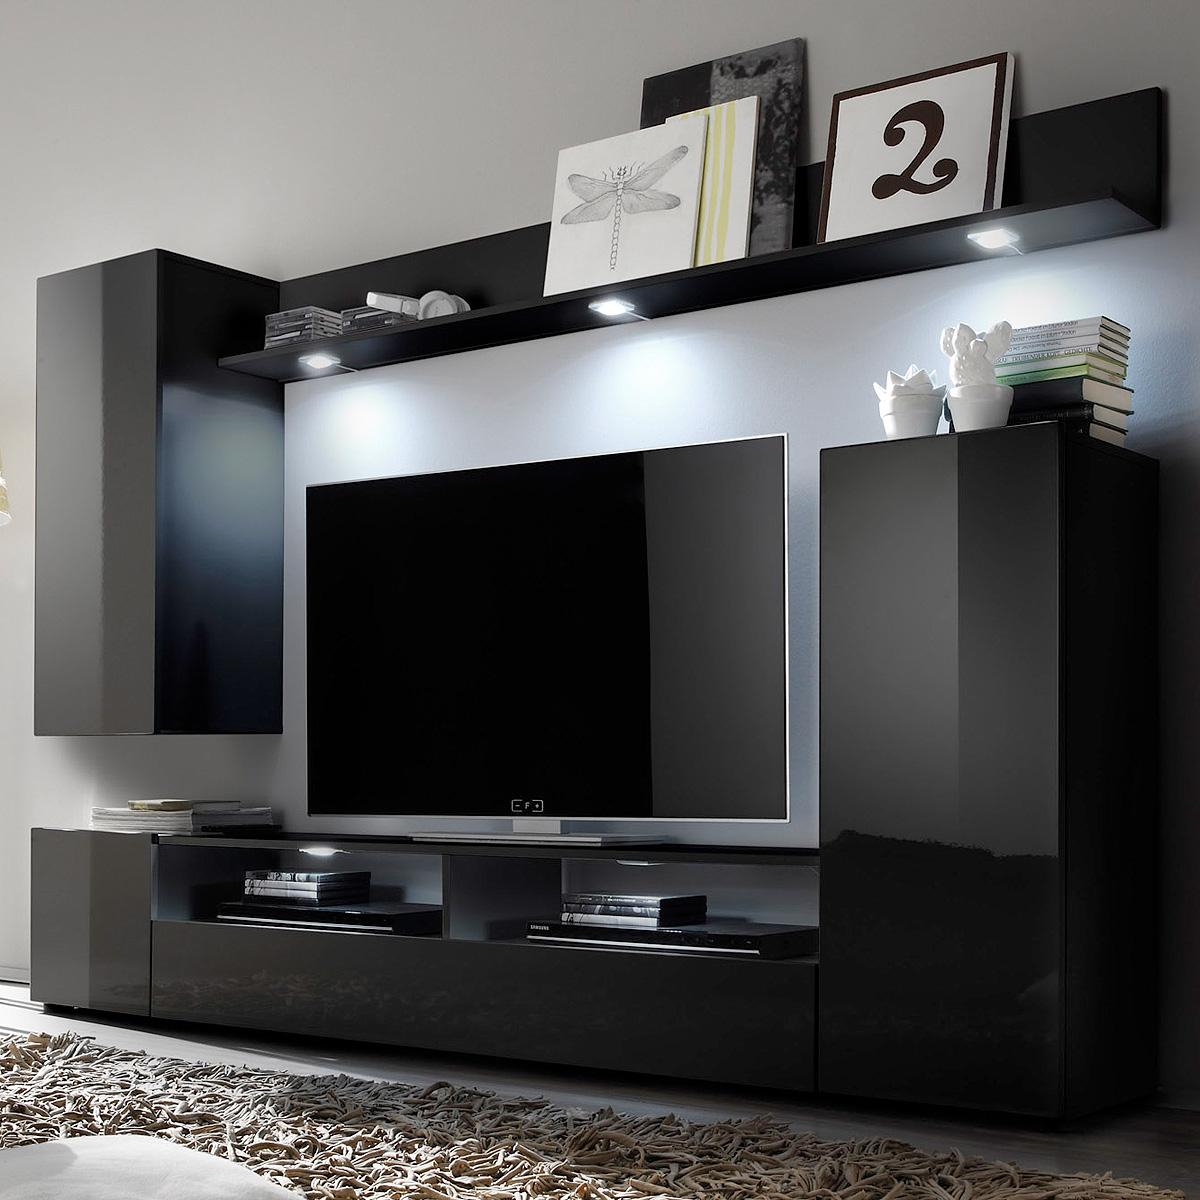 wohnwand dos anbauwand wohnkombi wohnzimmer front hochglanz farbe w hlbar ebay. Black Bedroom Furniture Sets. Home Design Ideas